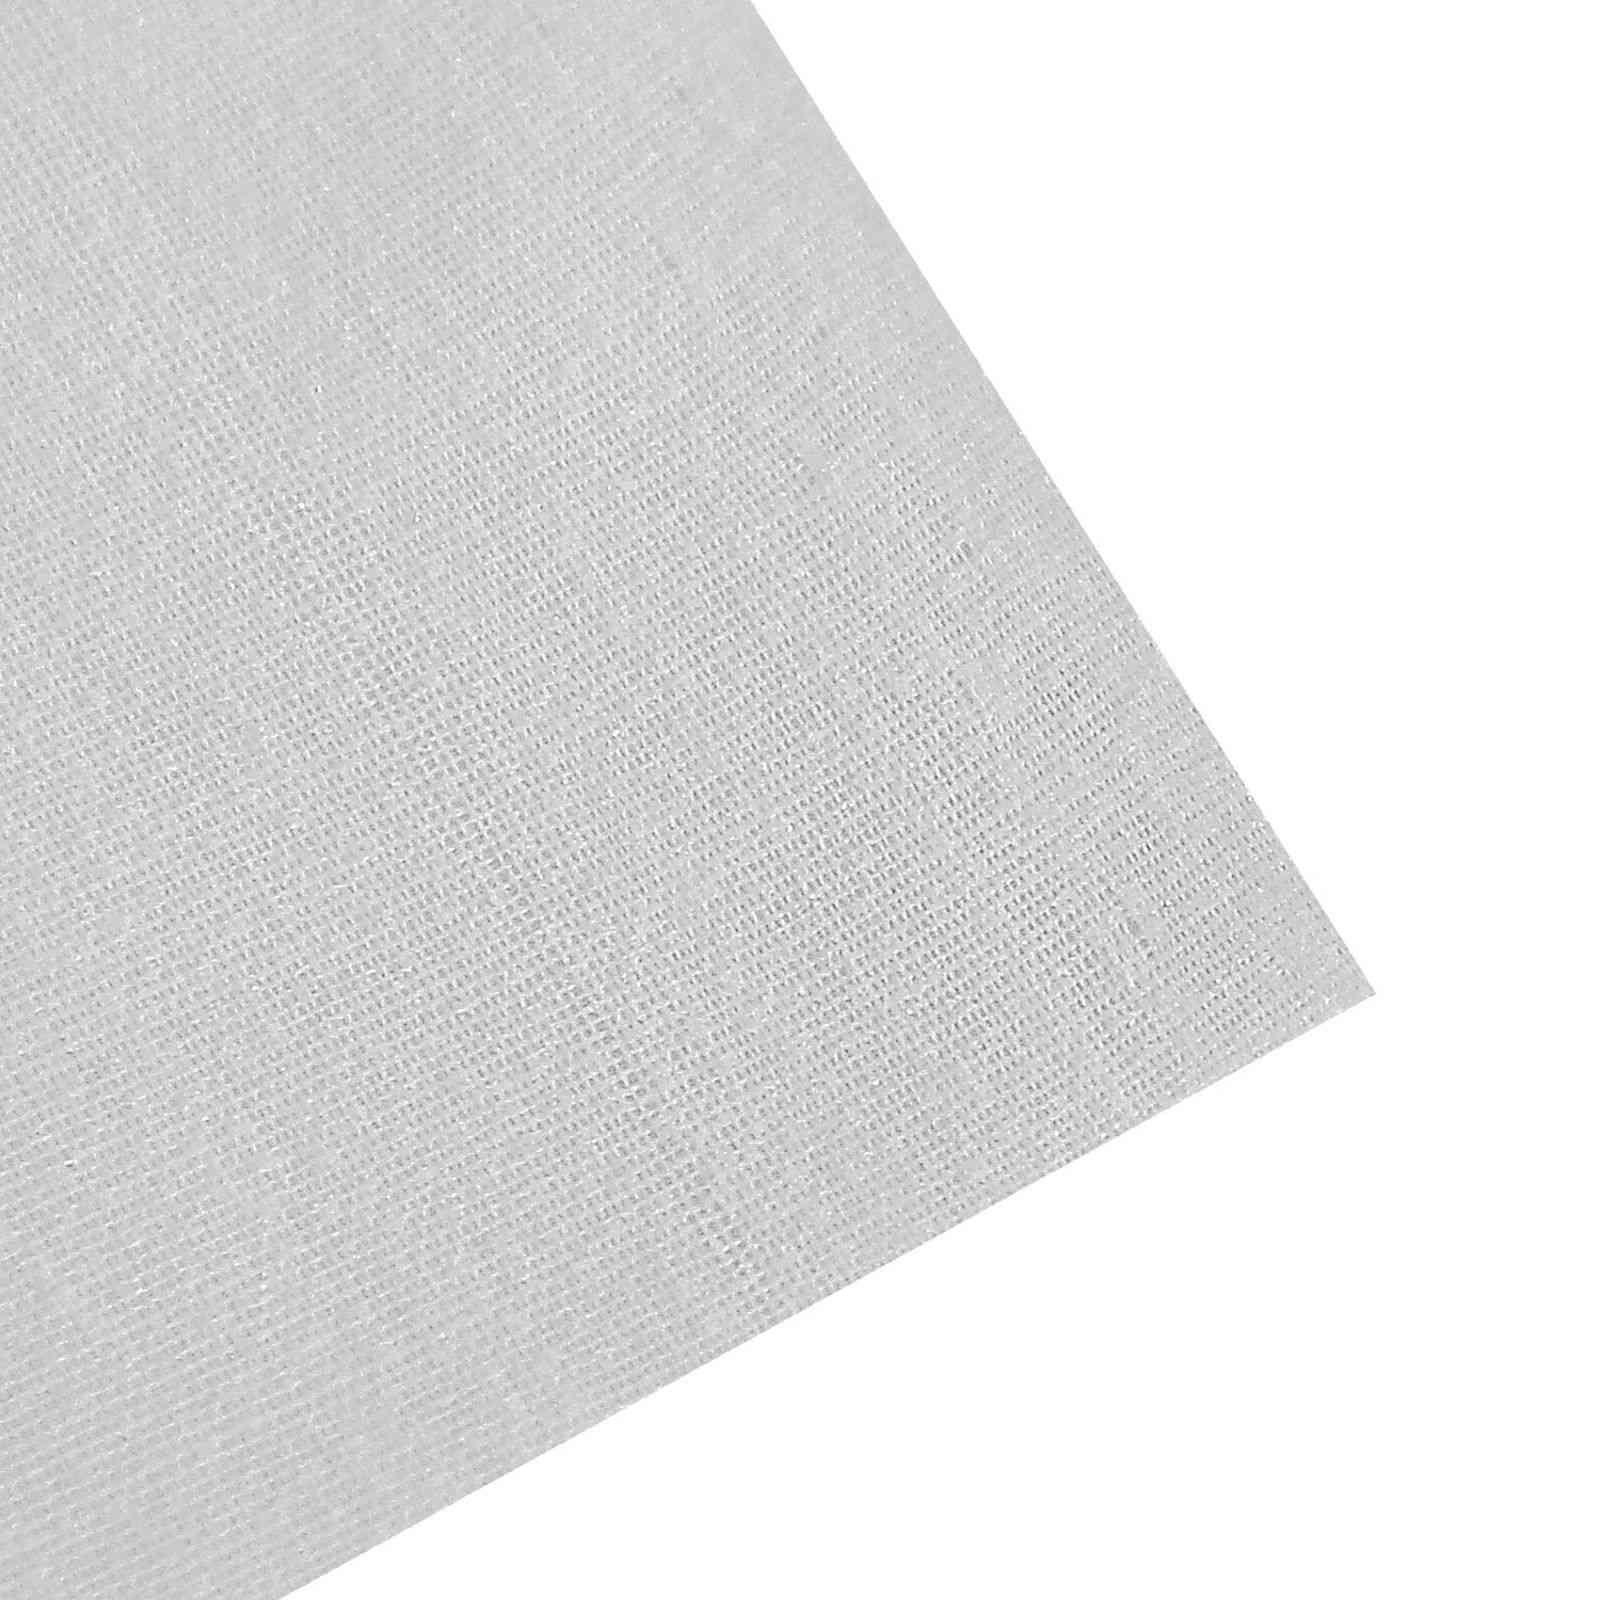 INT170 Дублерин 170гр/м 112см*100м, белый